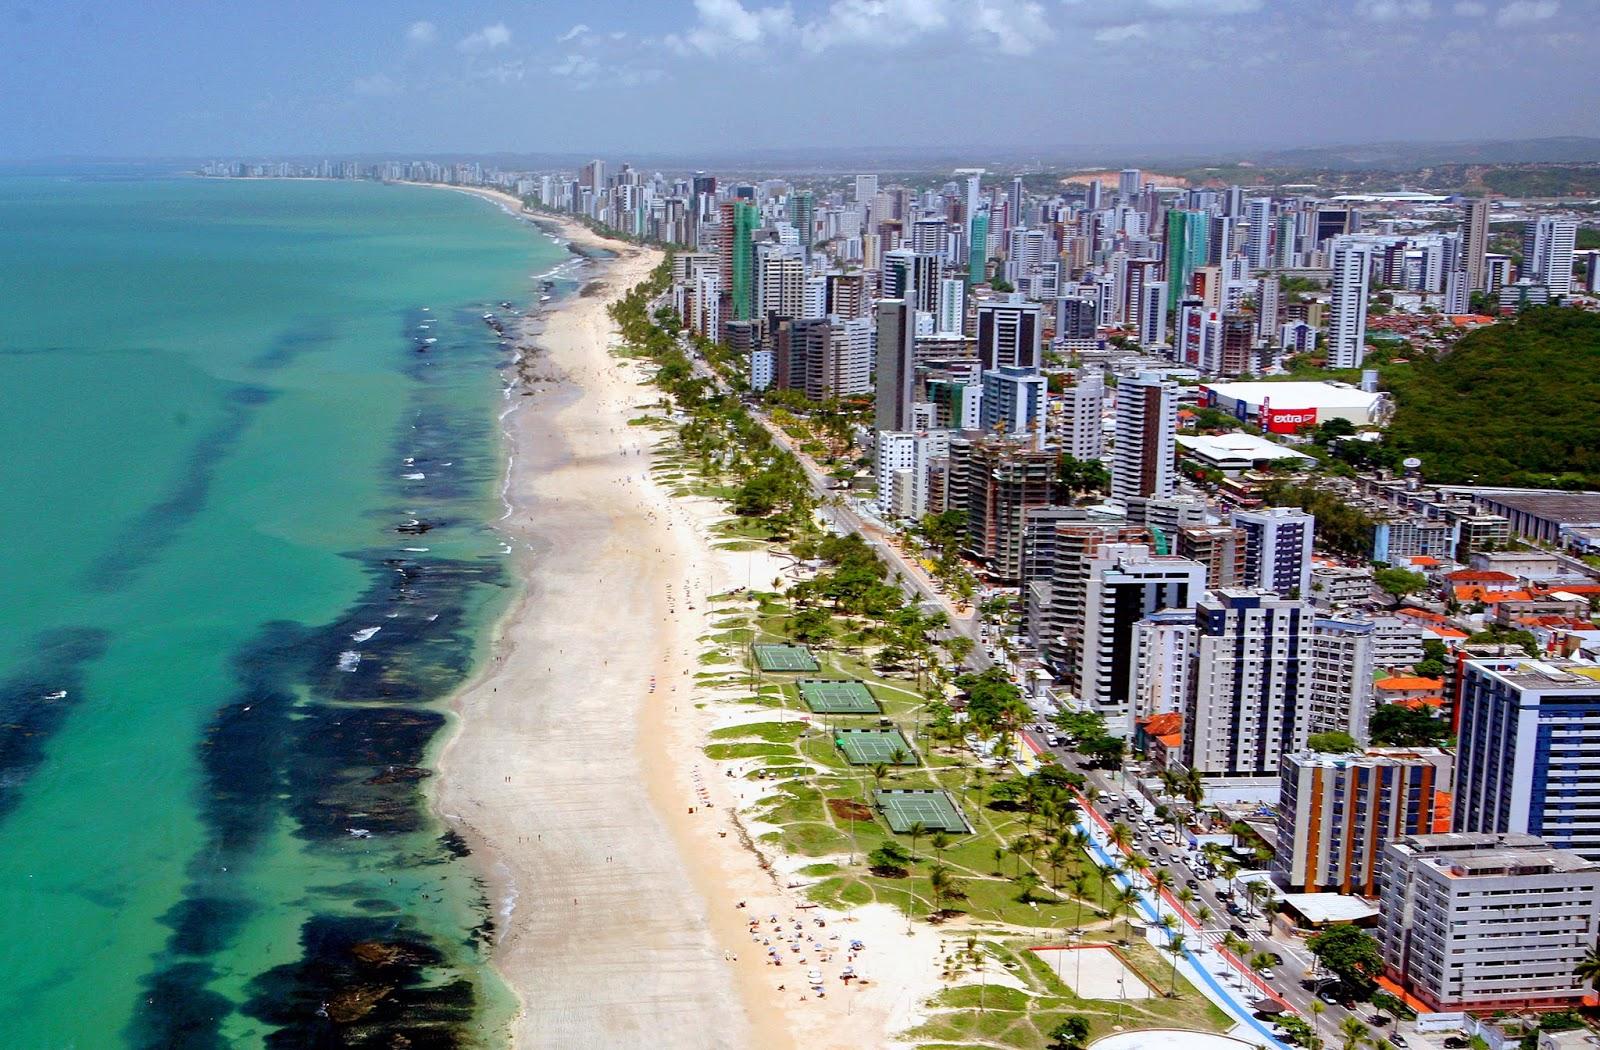 viaje a brasil, viajes universitarios, viajes para grupos